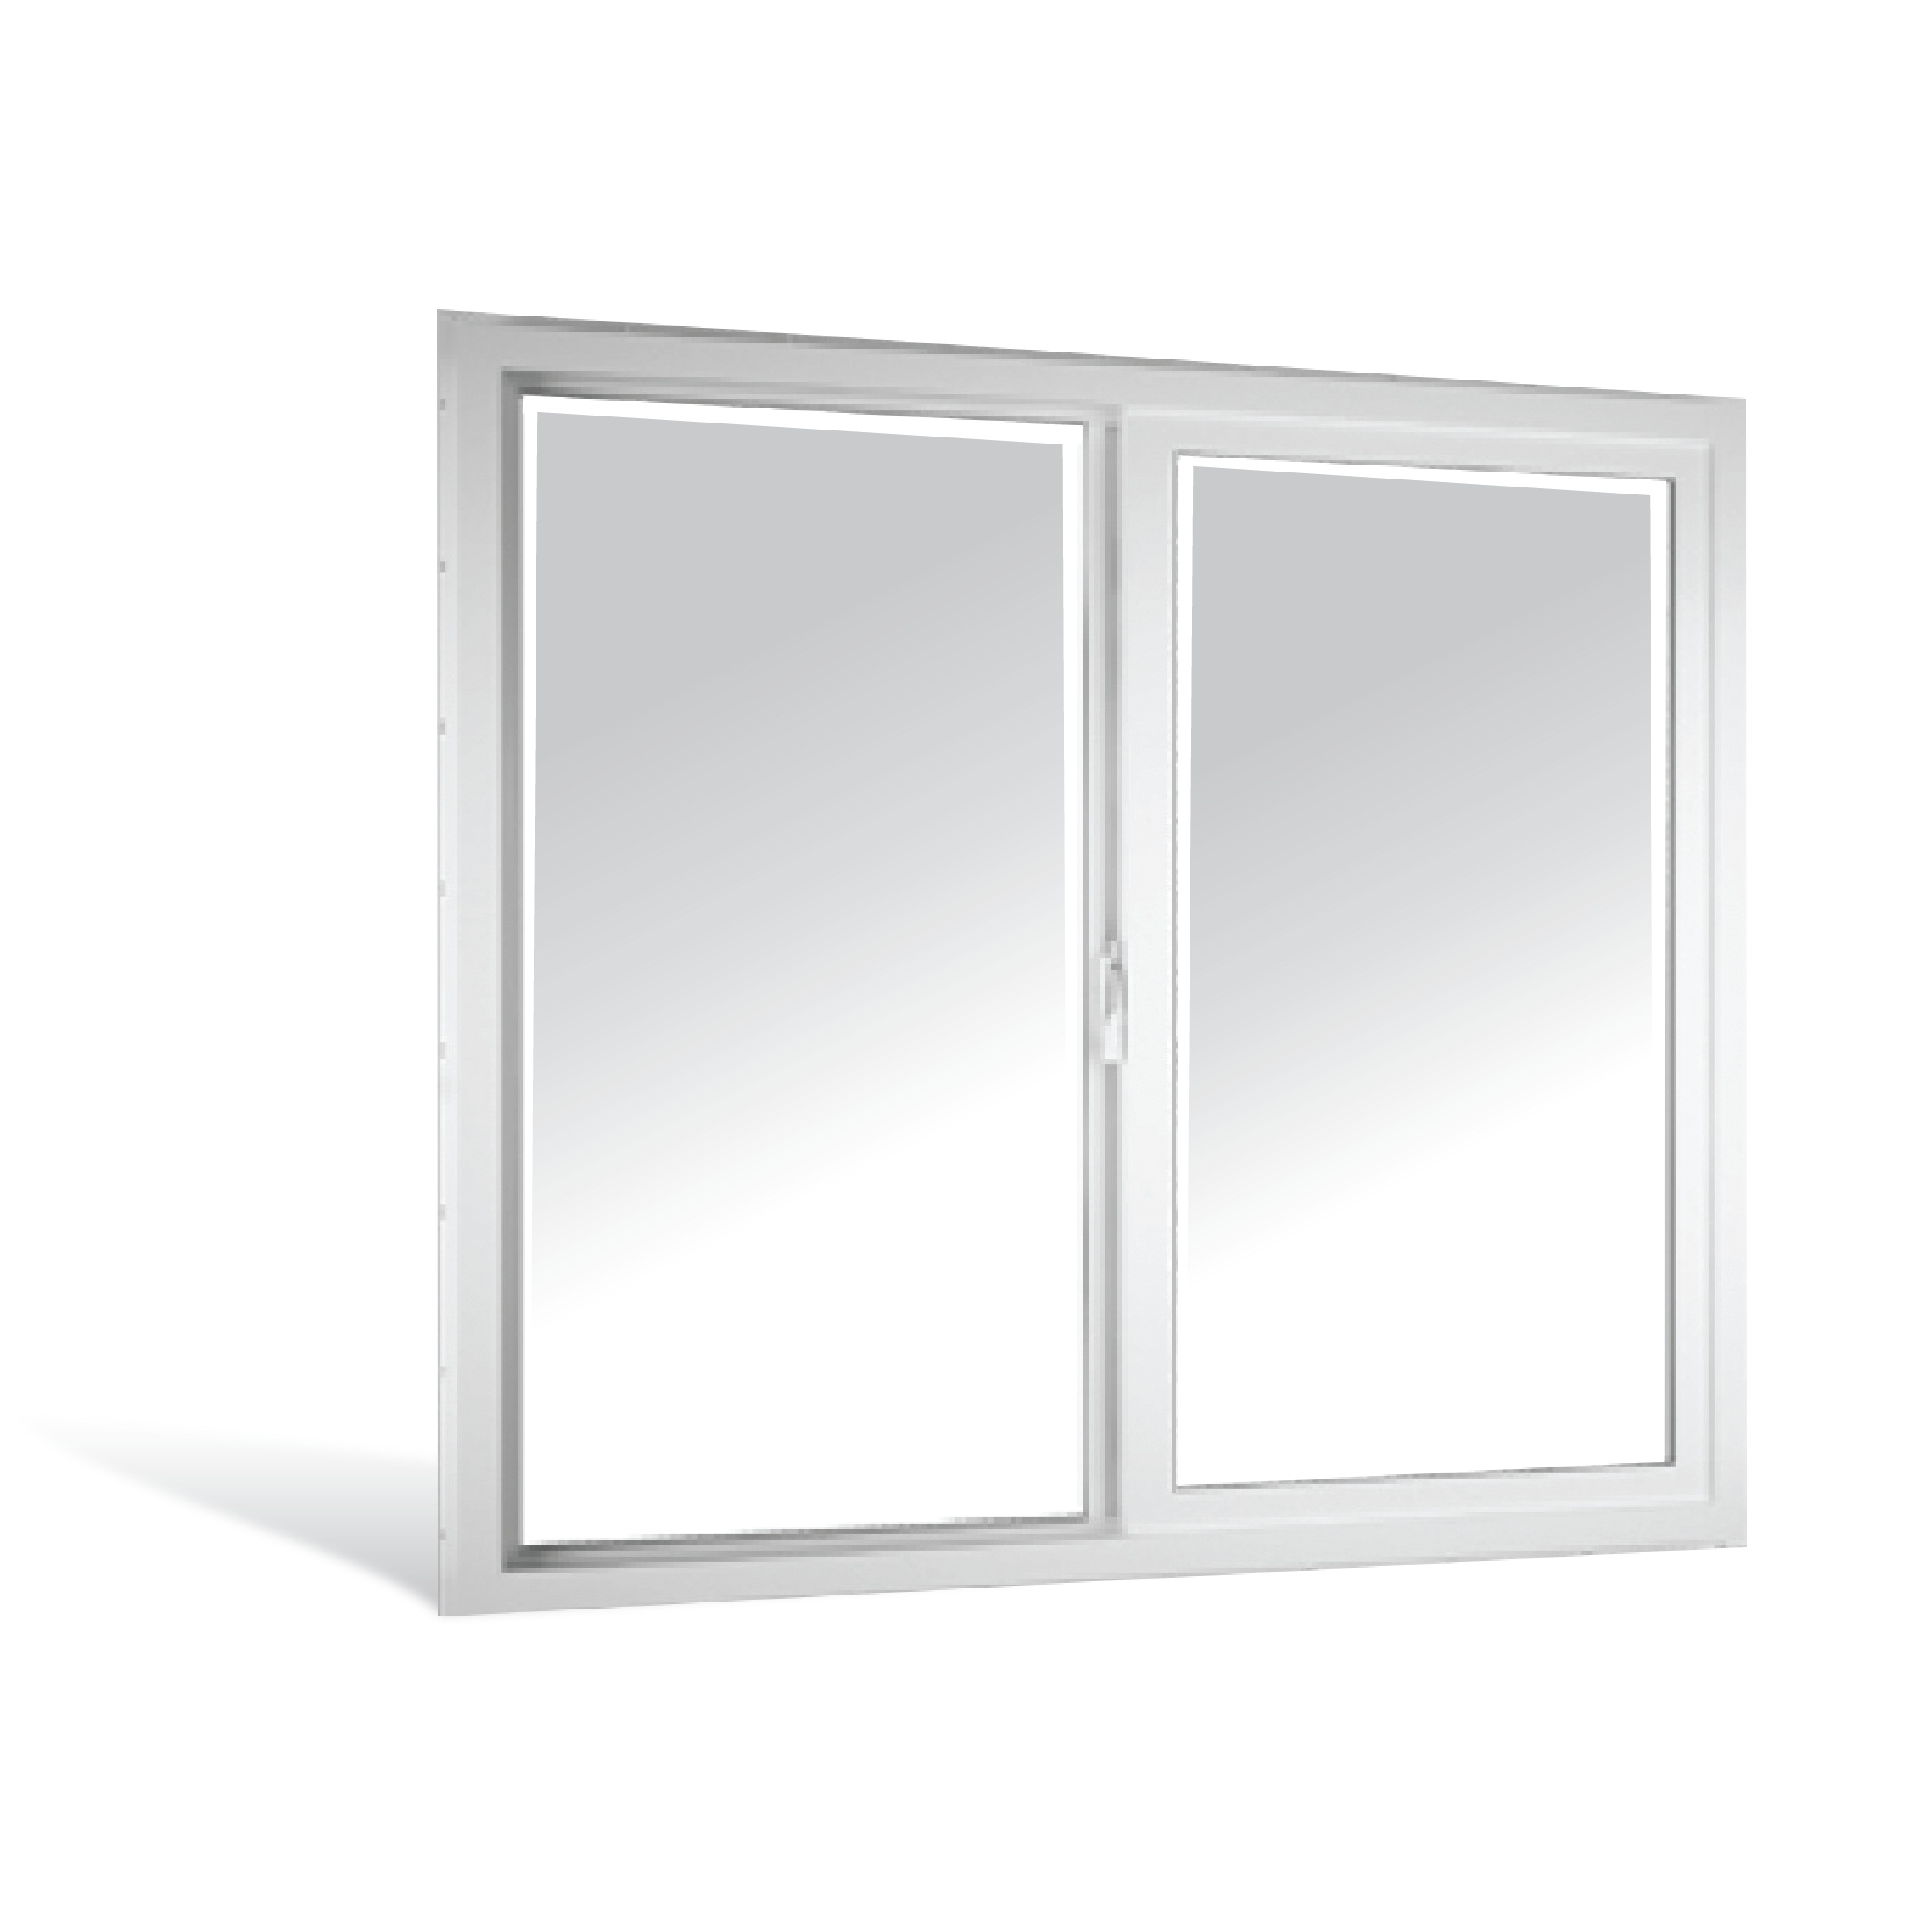 Ventana corrediza de 1m x 1m de PVC color blanco